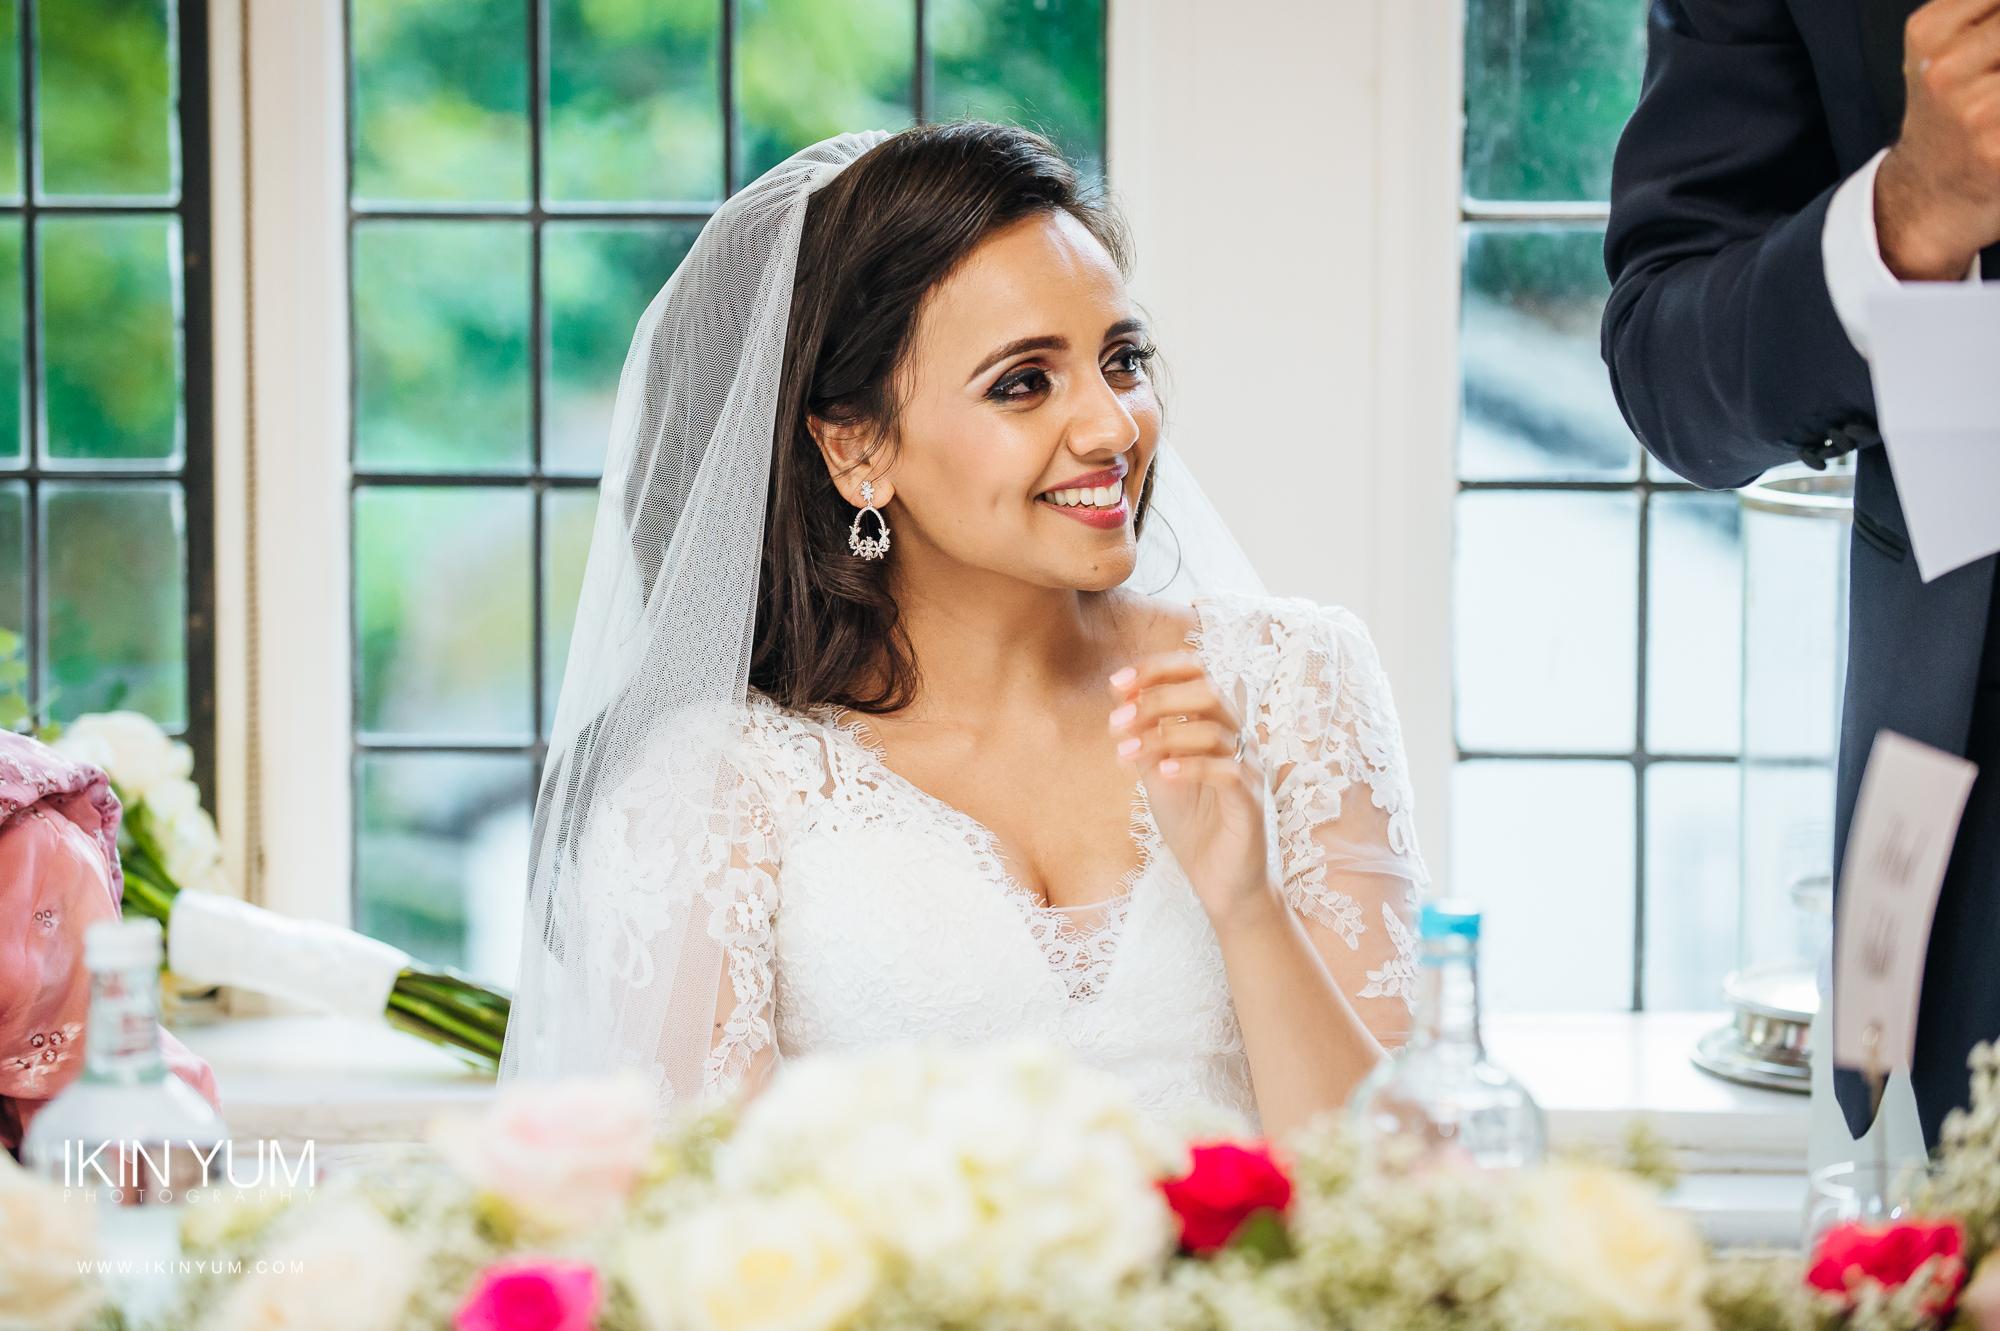 Laura Ashley Manor Wedding - Ikin Yum Photography-125.jpg